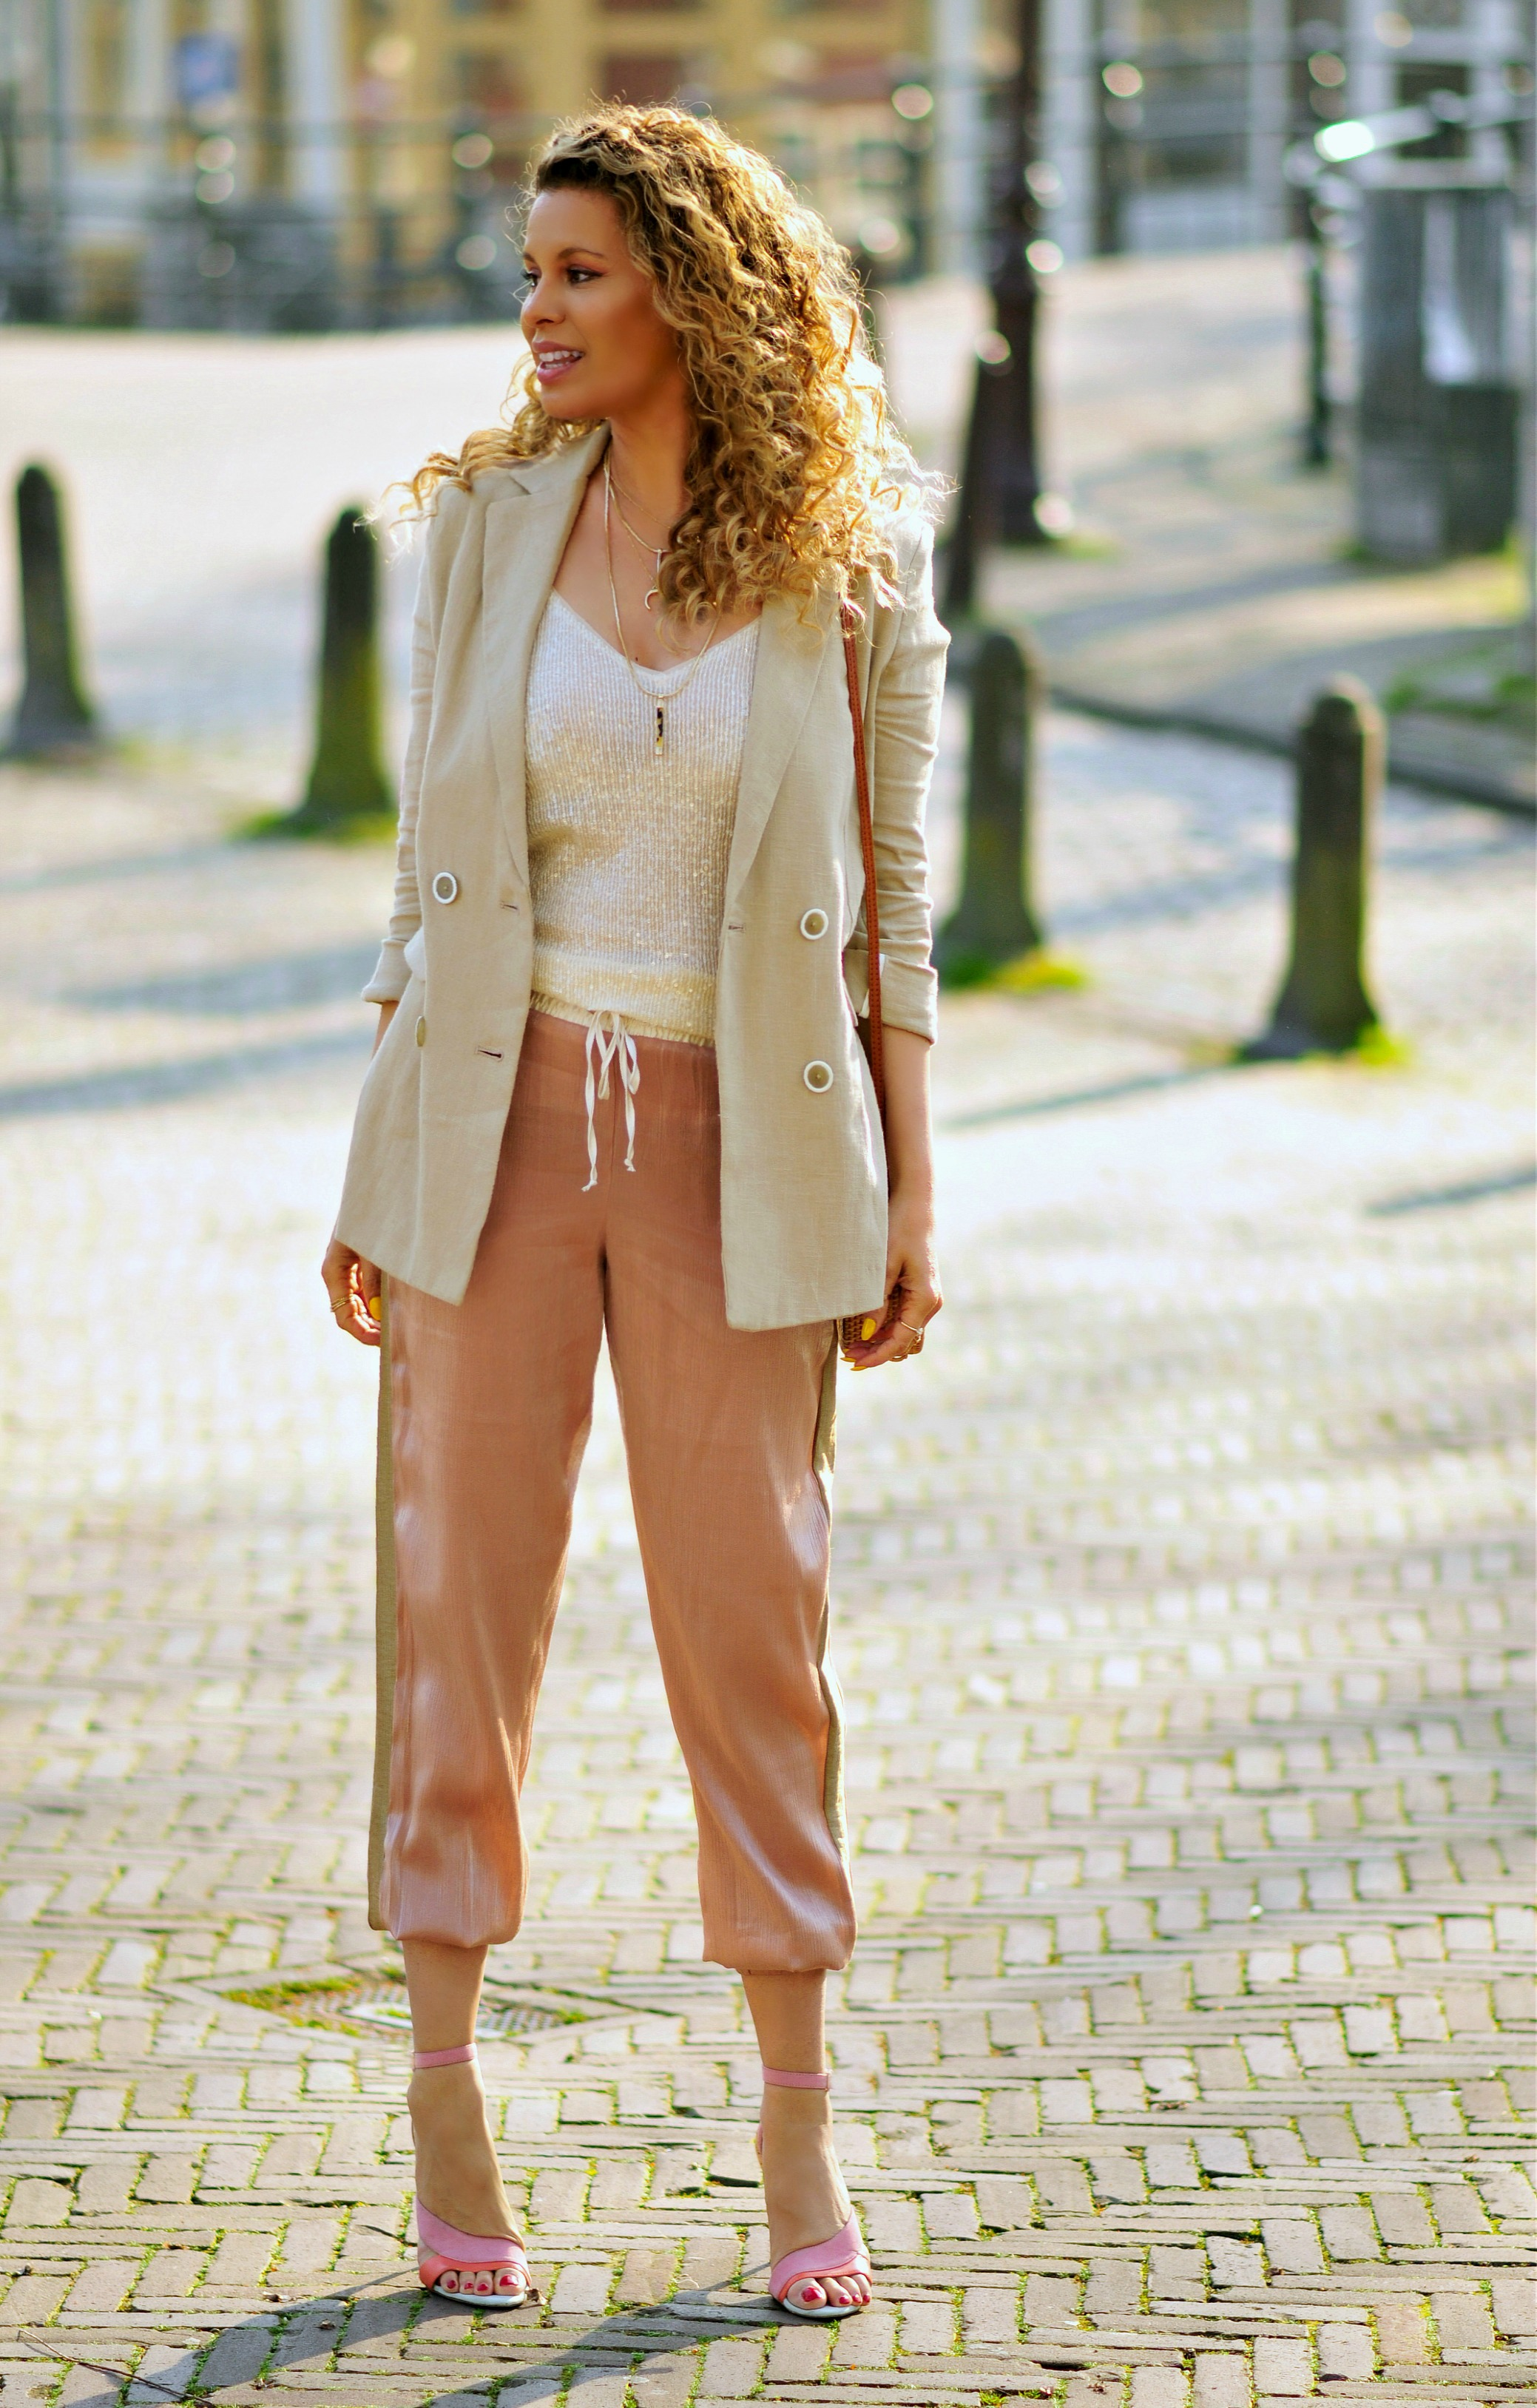 My Go-To Outfit For Spring, Tamara Chloé, Safari blazer, Bali bag8+2